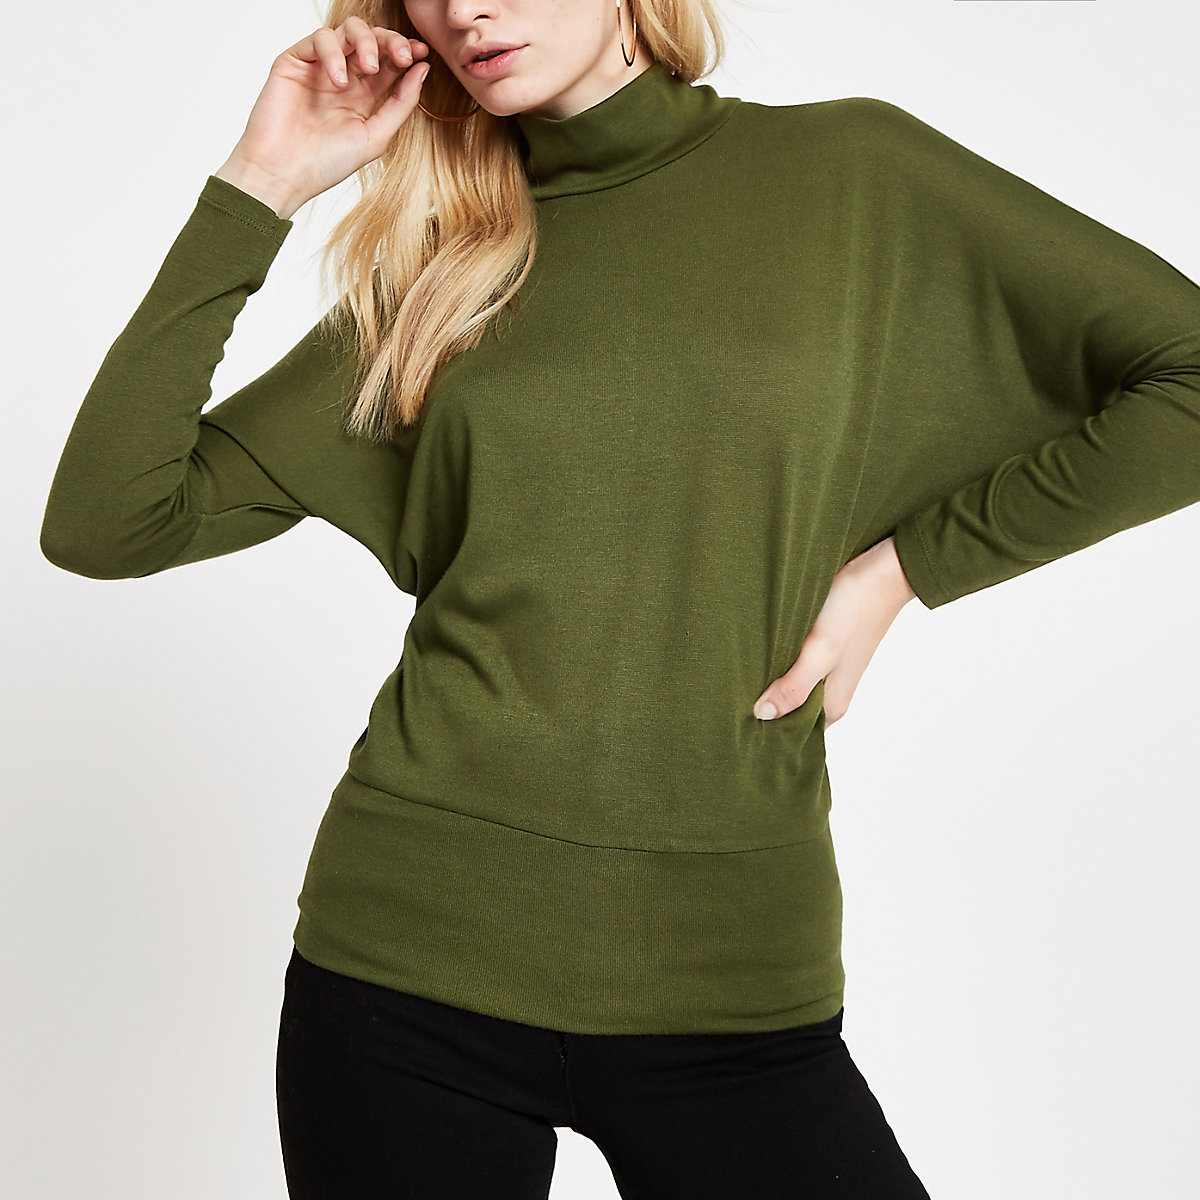 Green high neck batwing sleeve top